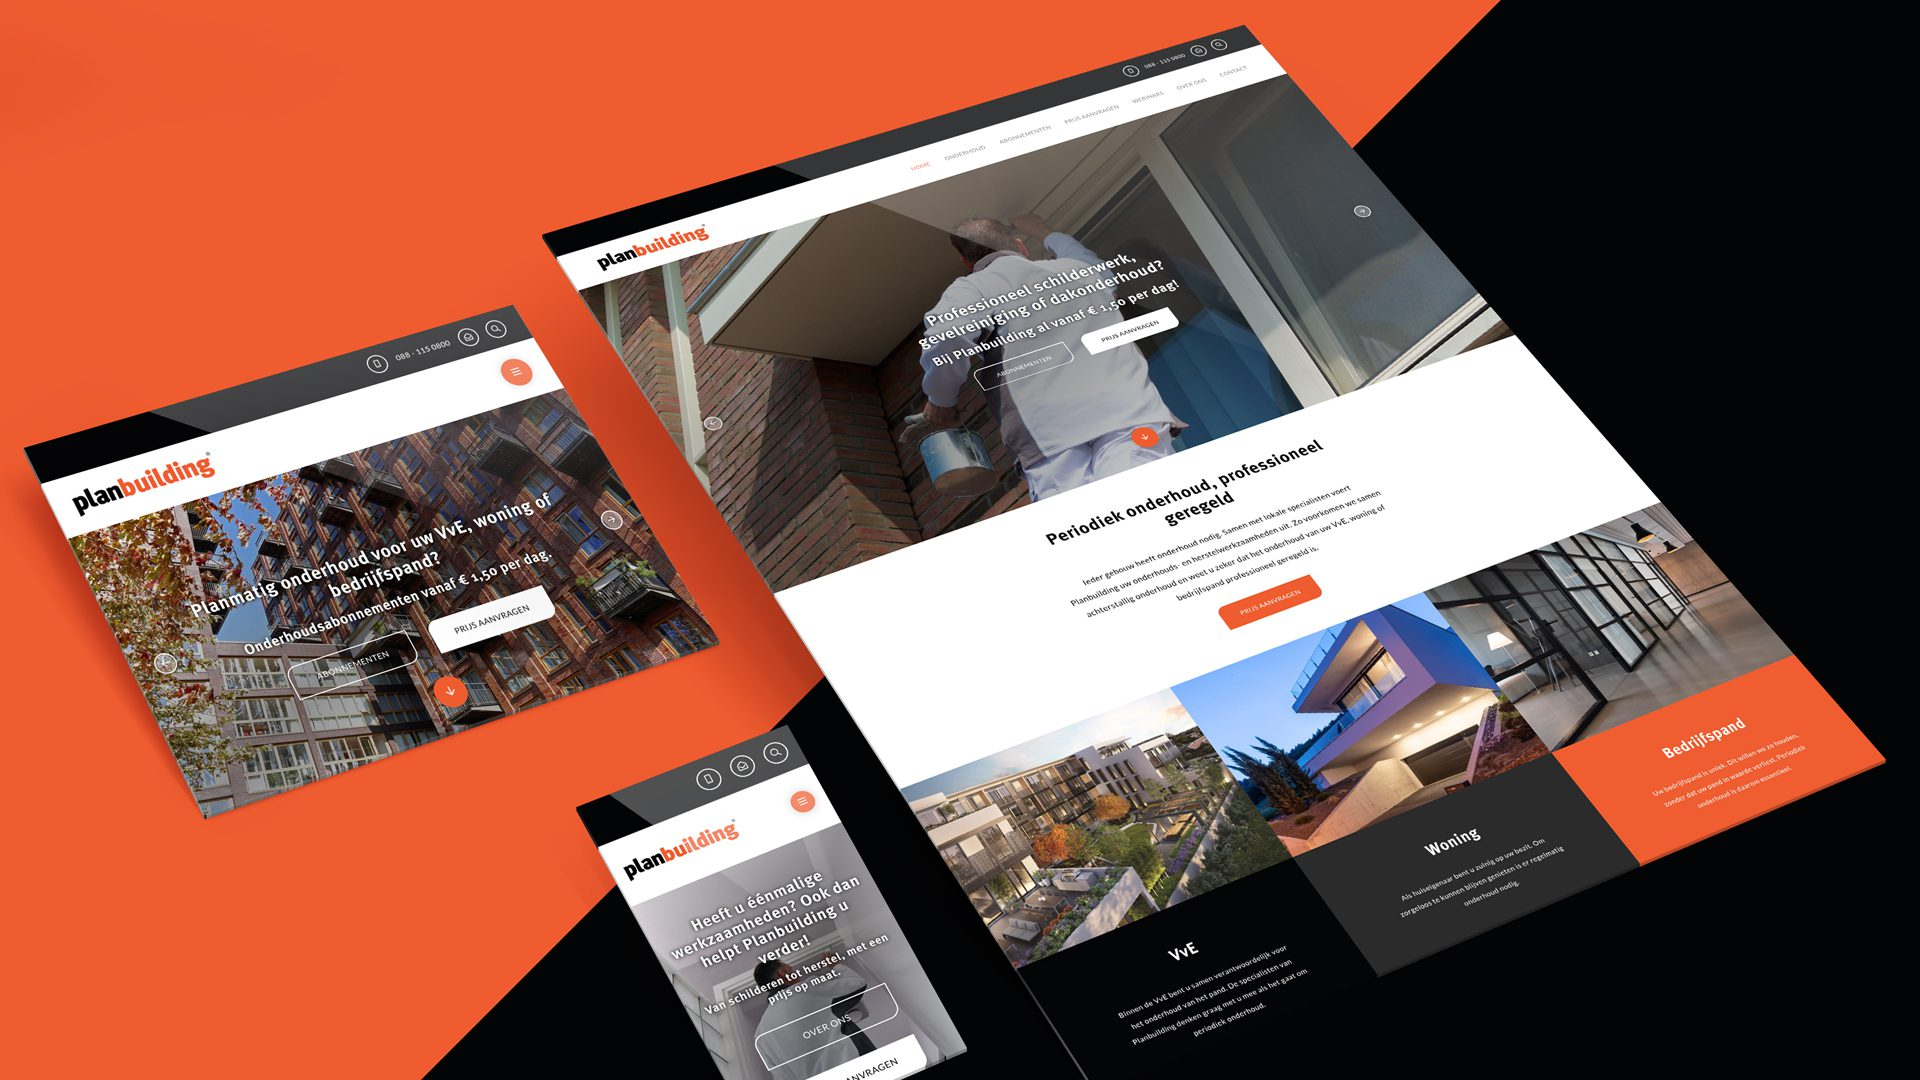 websquad-mockup-planbuilding